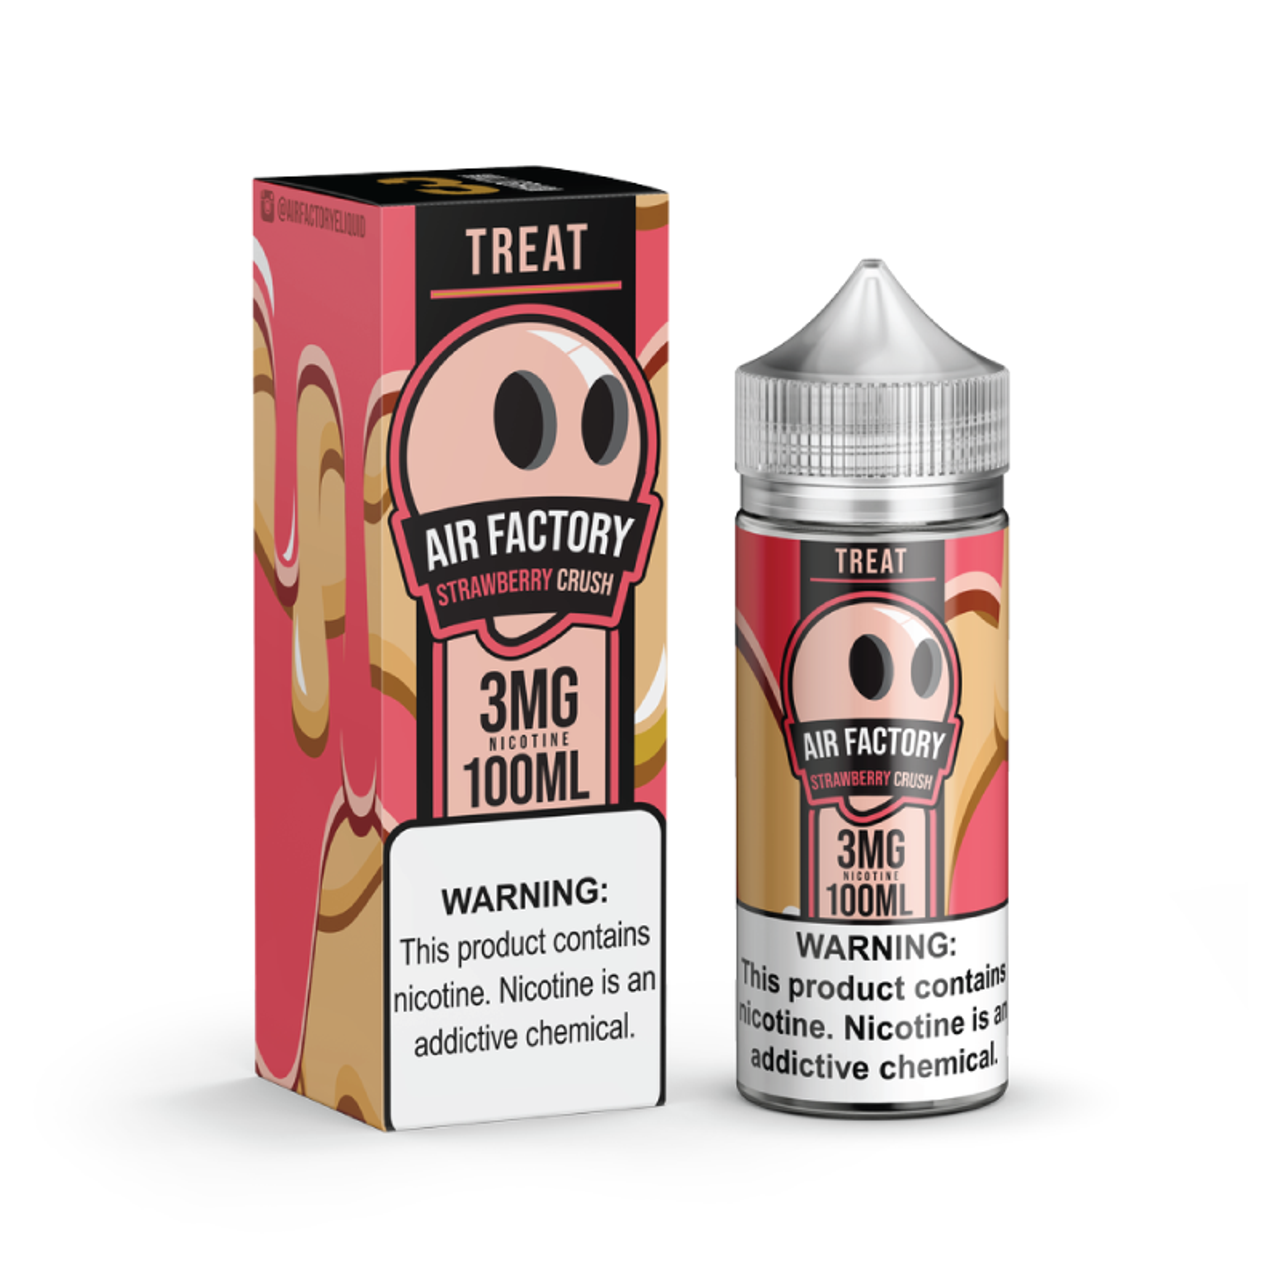 Strawberry Crush E-Juice by Air Factory Treat E-Liquid 100ML